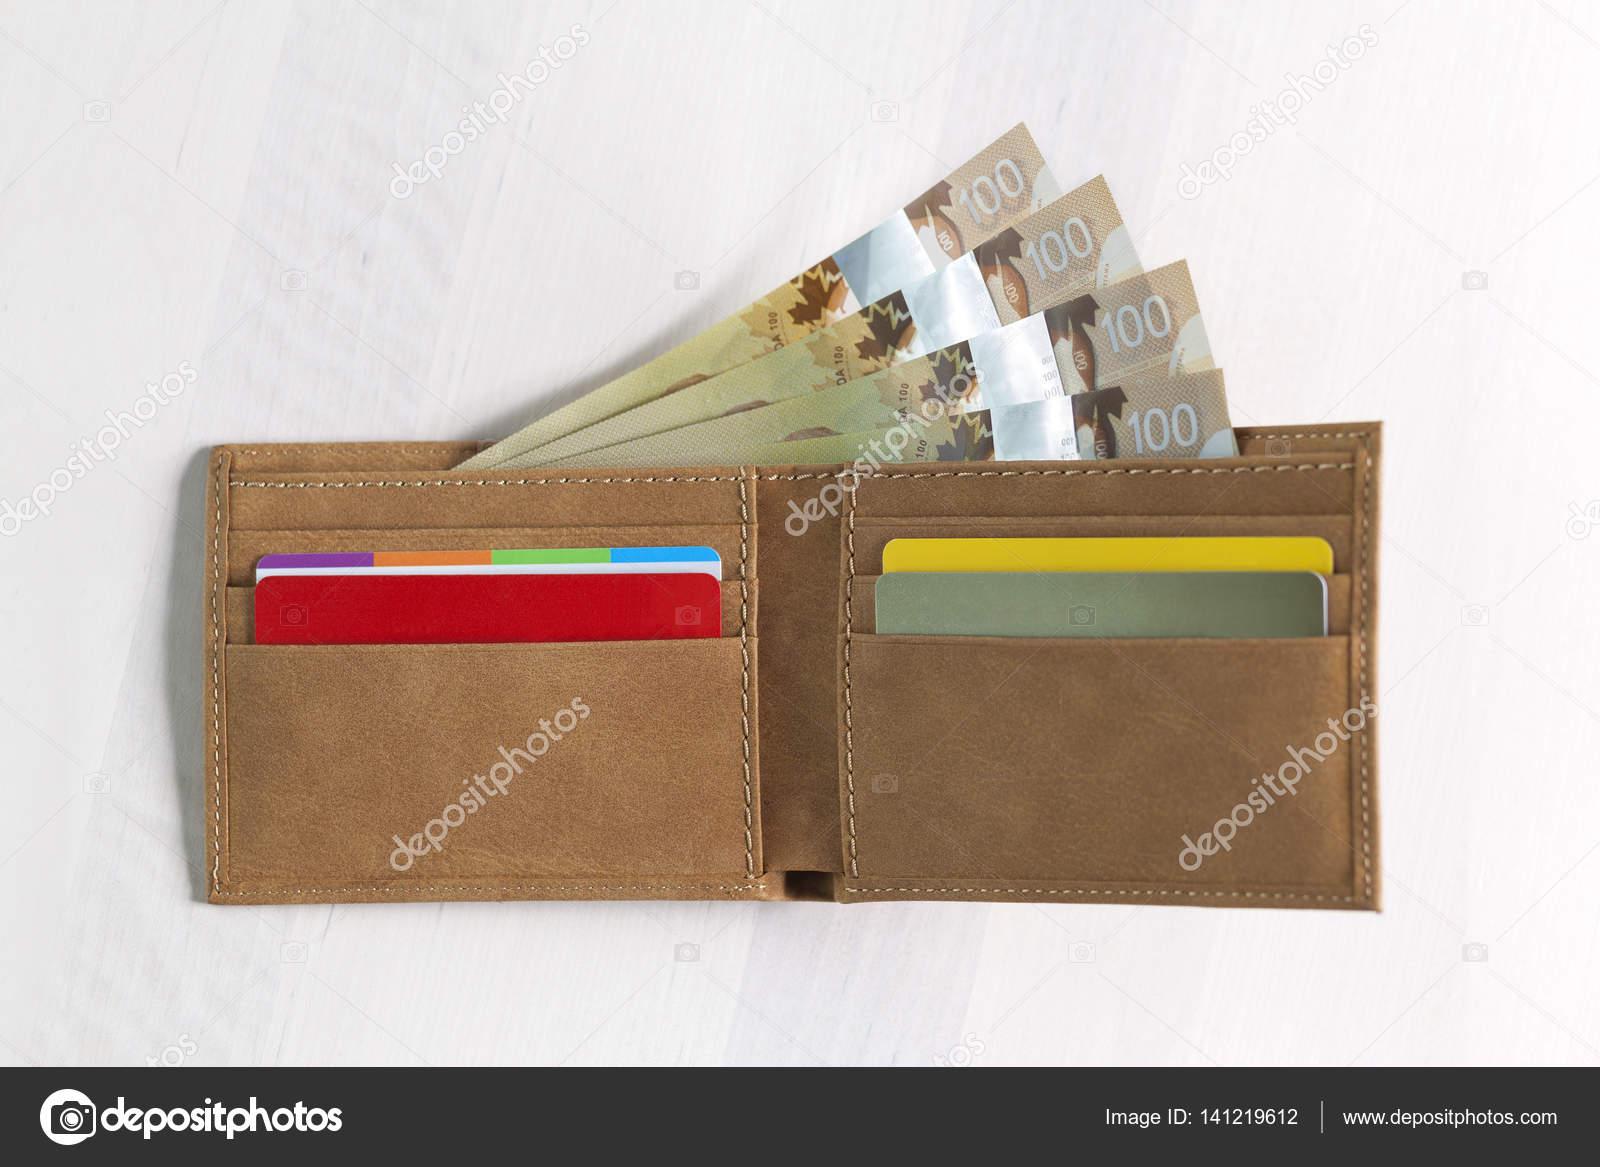 Gekleurde Leren Portemonnee.Canadese Dollars In Mosterd Gekleurde Lederen Portemonnee